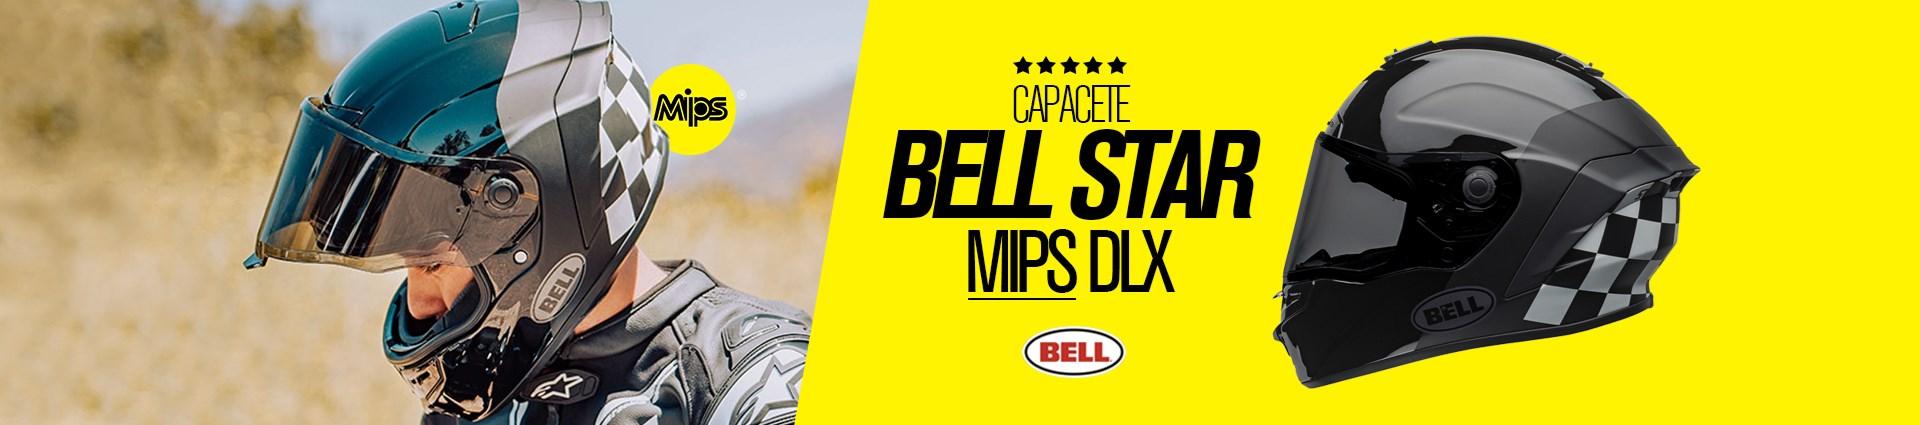 Bell - Star Mips DLX